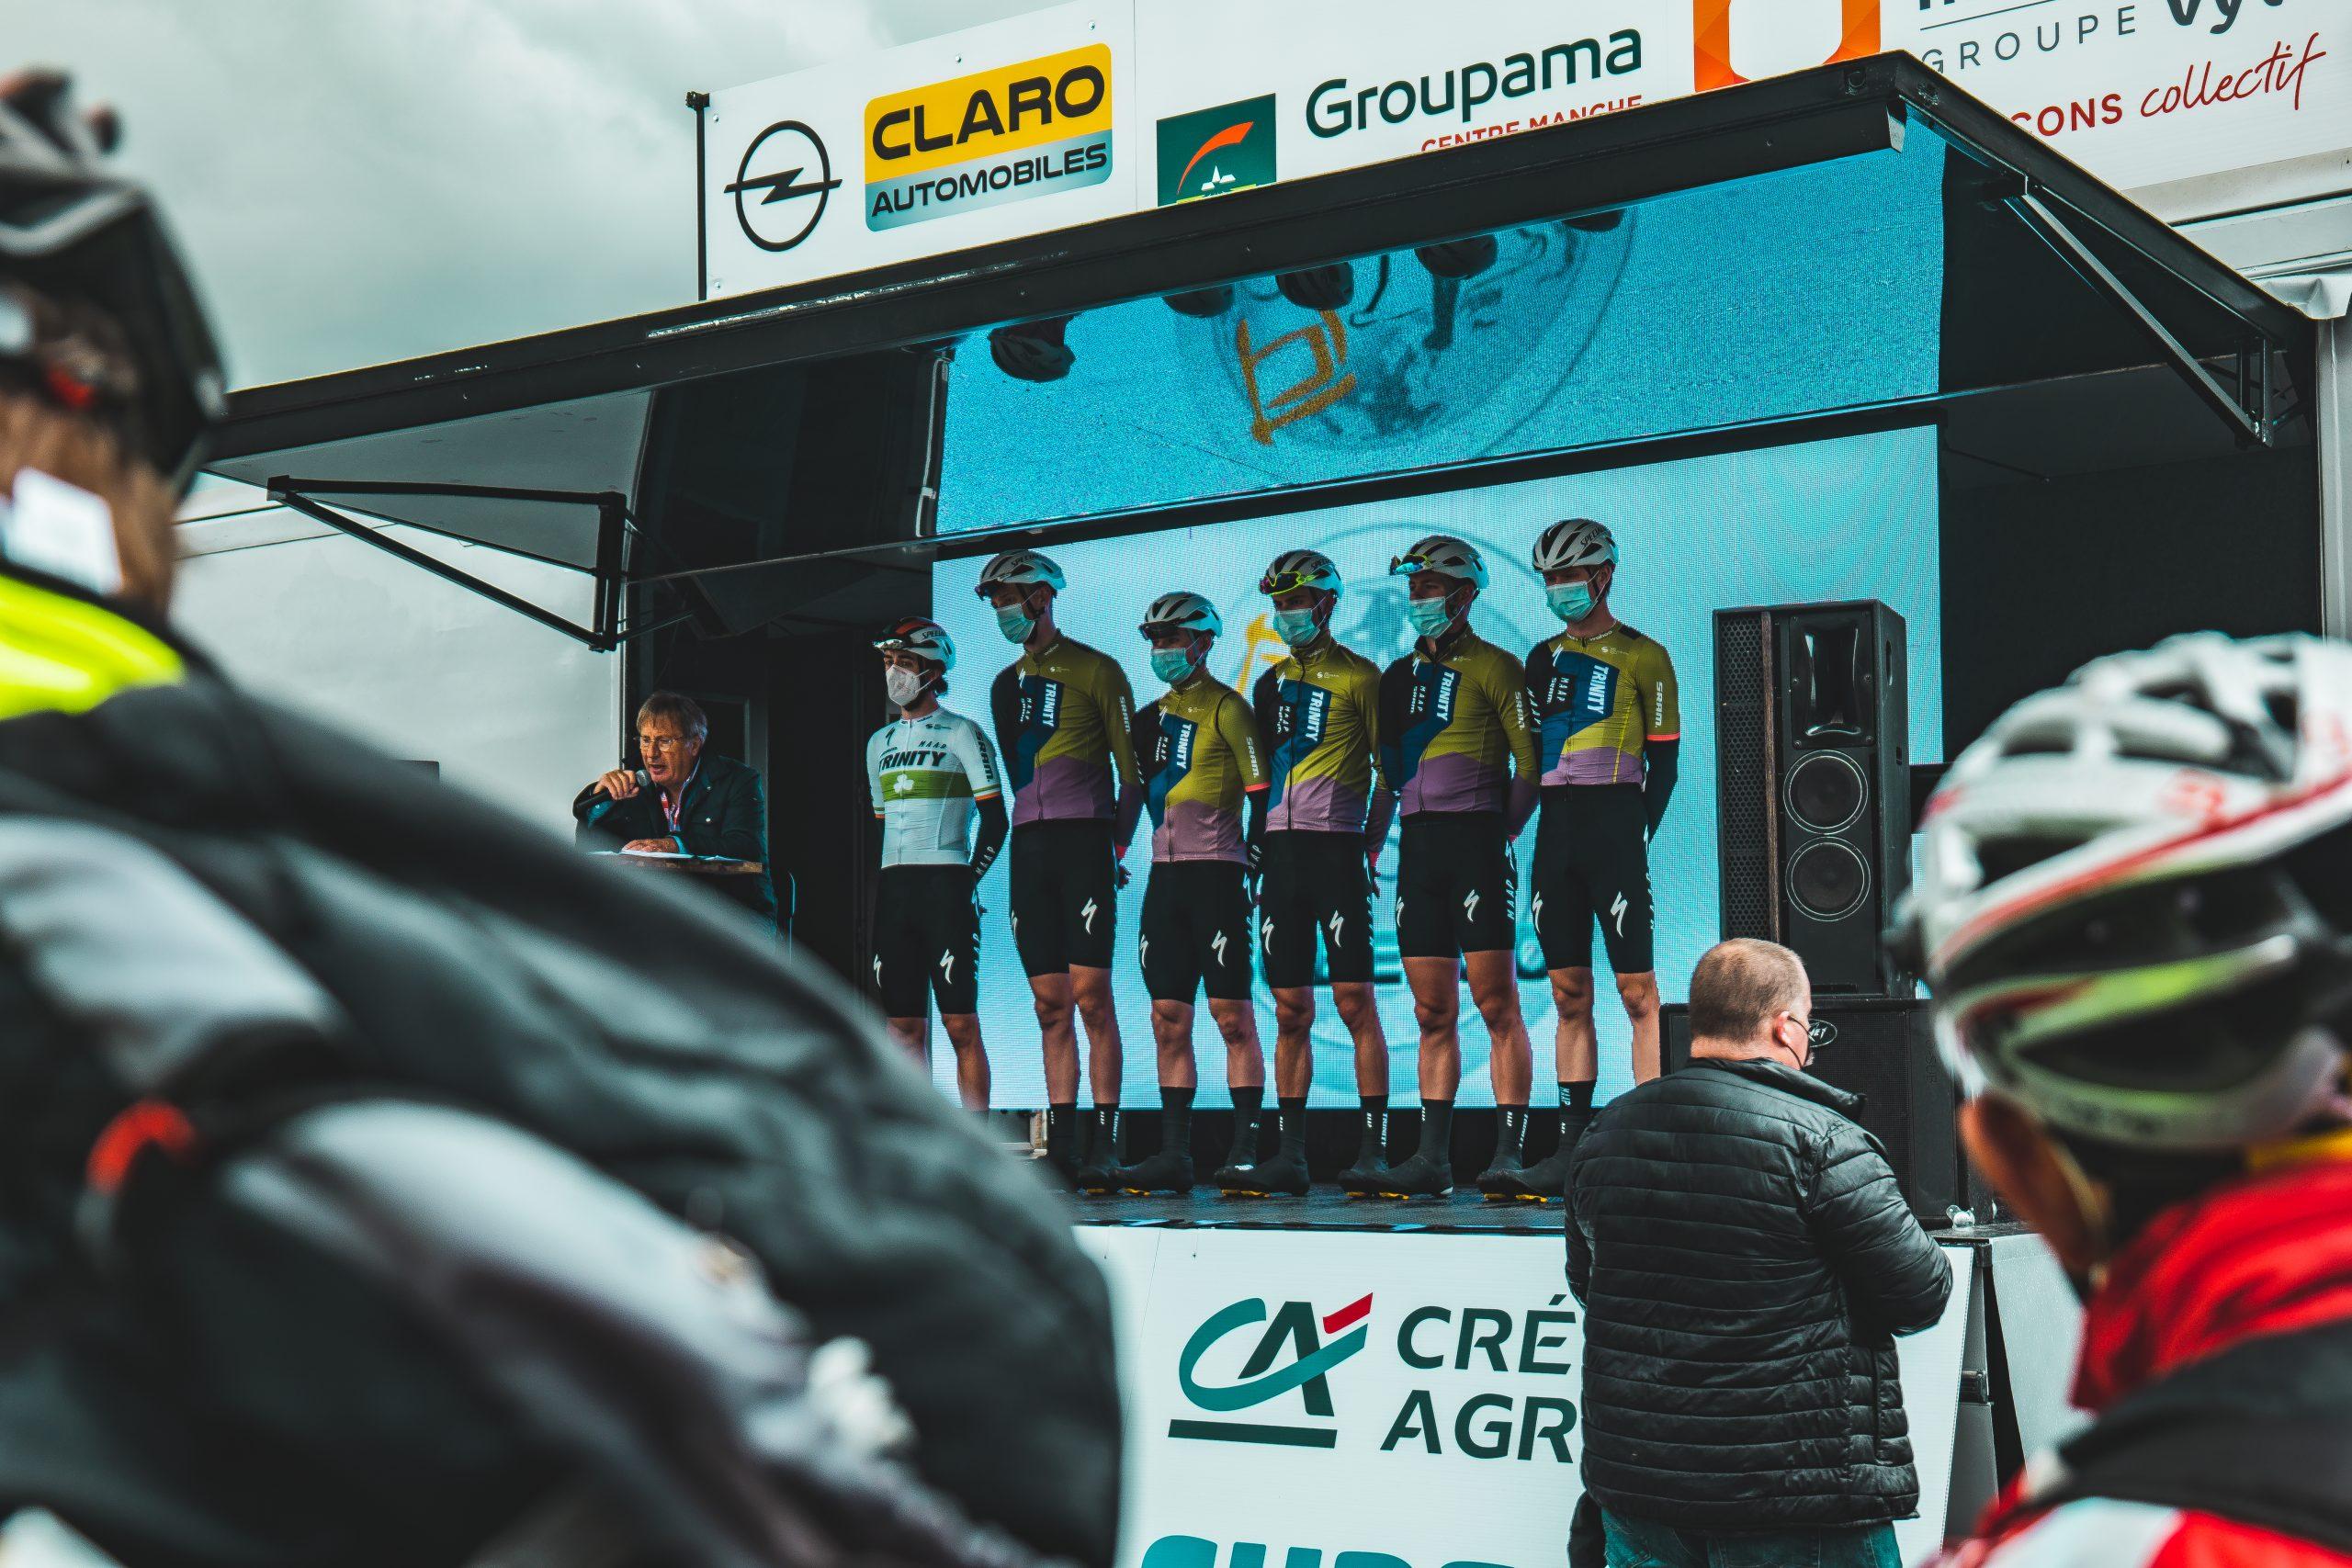 Tour-d'eure-et-loir-trinity-racing-luke-lamperti-ben-turner